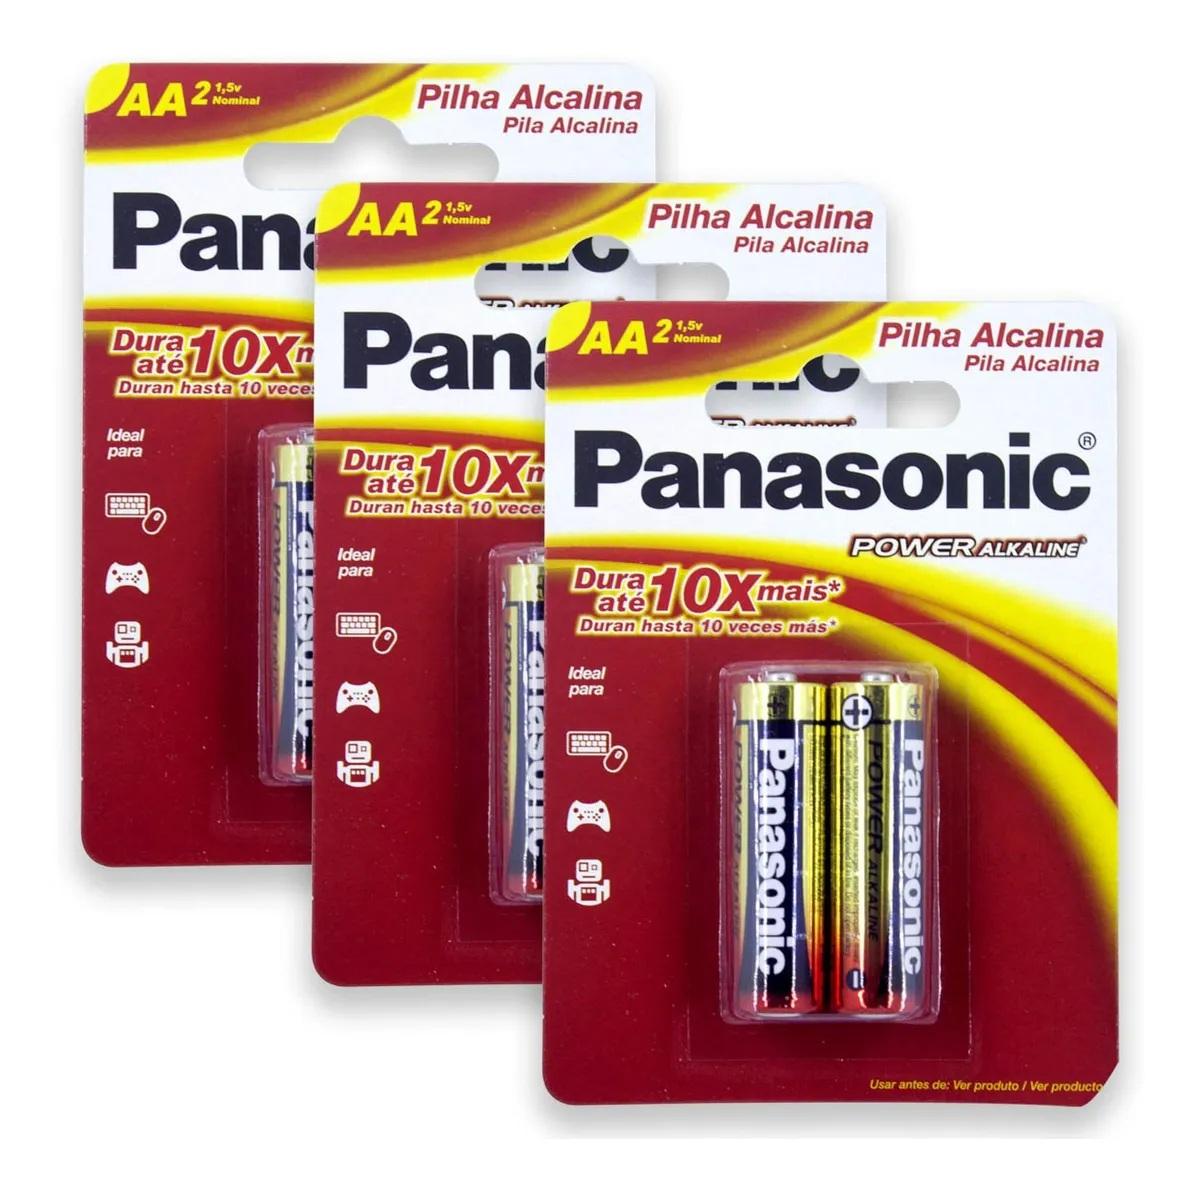 Pilha Alcalina Panasonic Aa Cartela C/6 Unidades